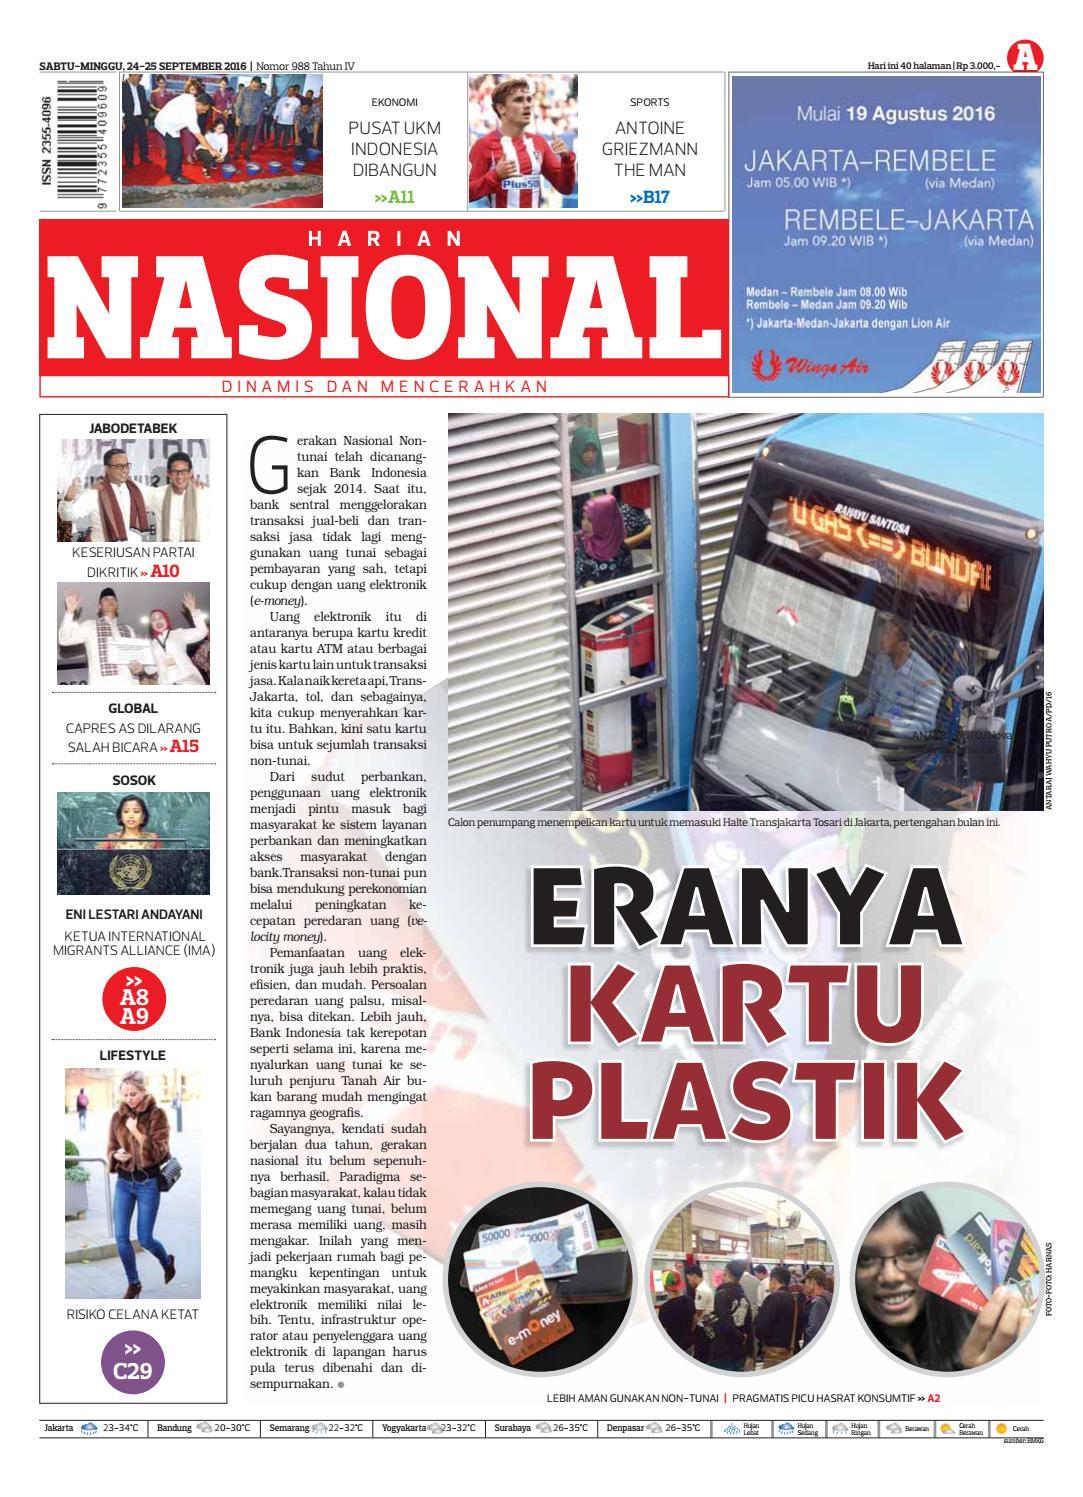 Harian Nasional By Issuu Produk Ukm Bumn Bale Sehat Teh Rosella Merah 3 Box